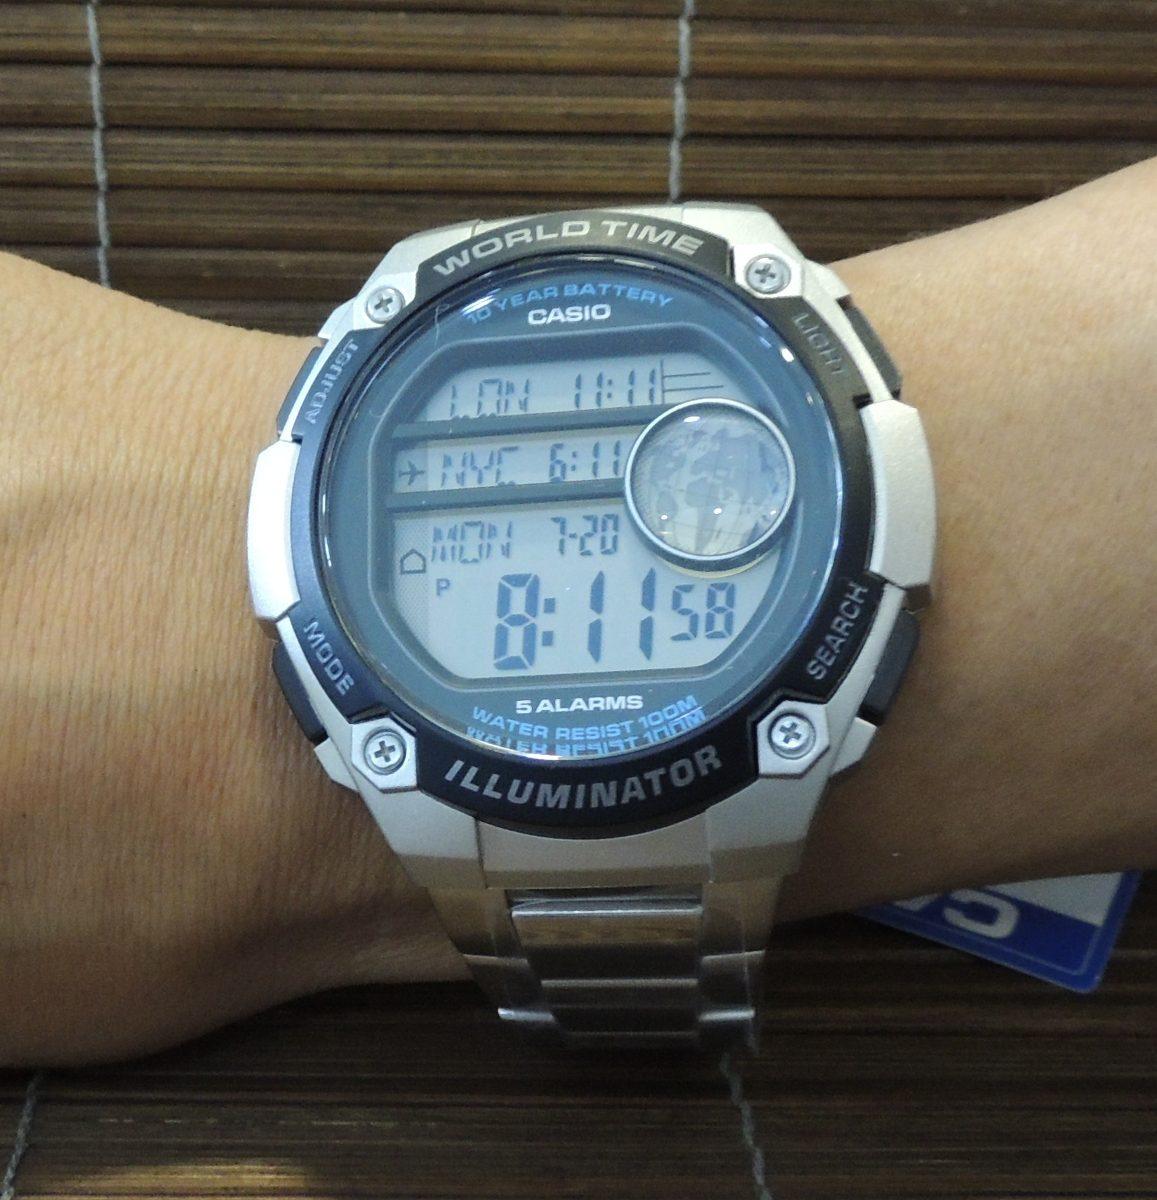 f63539c6c1f Relógio Casio Hora Mundial Ae-3000wd-1avdf - Nota Fiscal gar - R ...